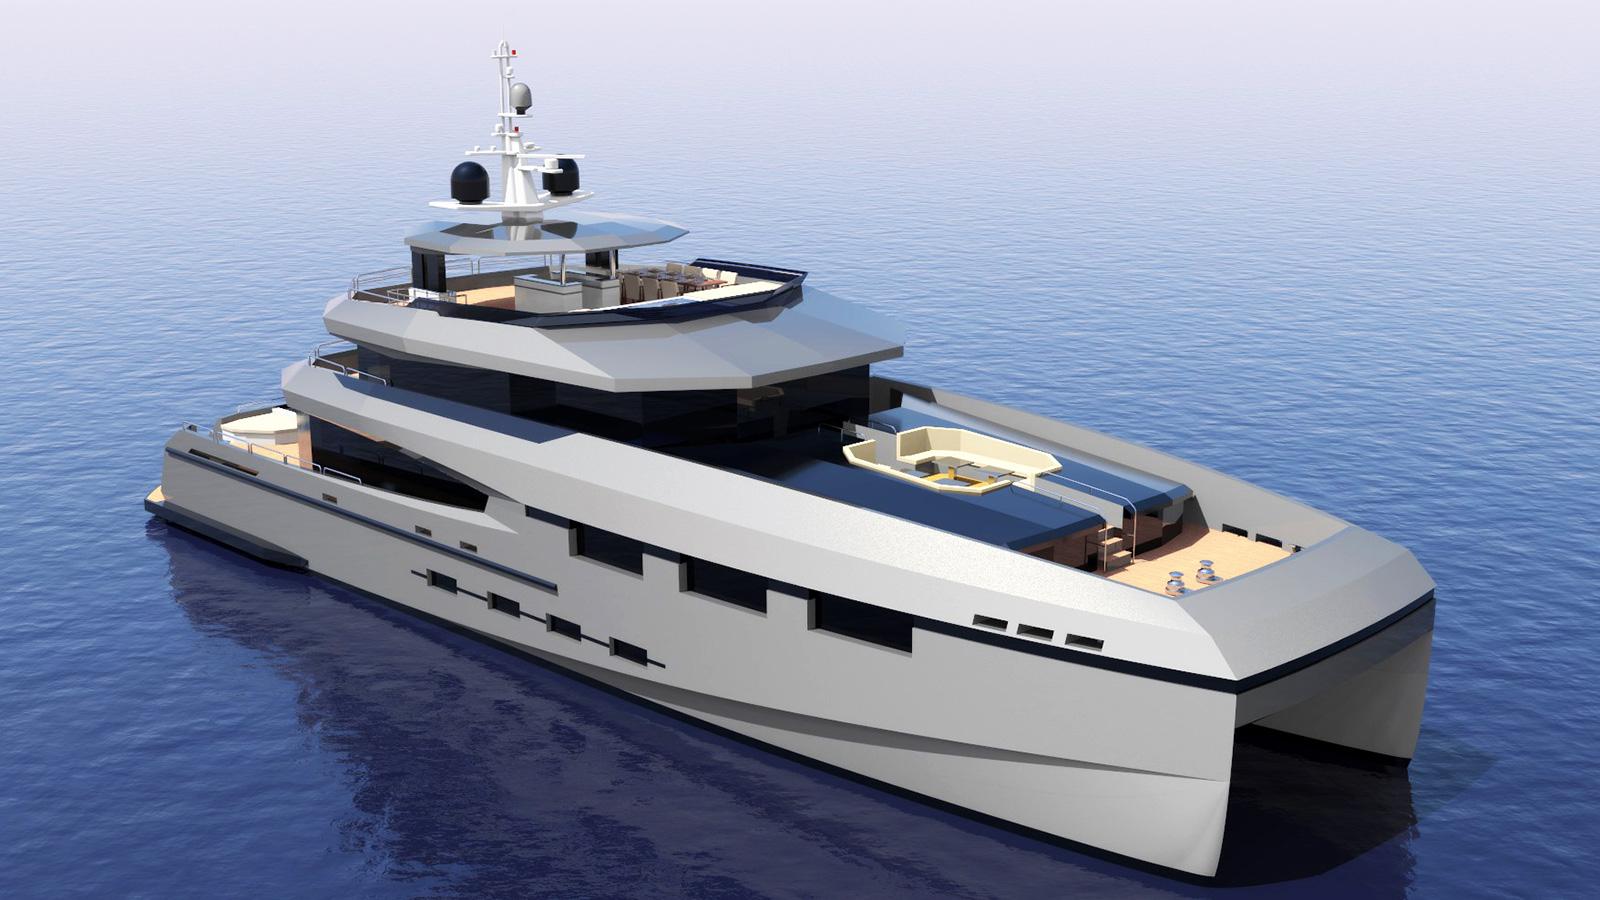 the-bow-of-the-heysea-135-vista-catamaran